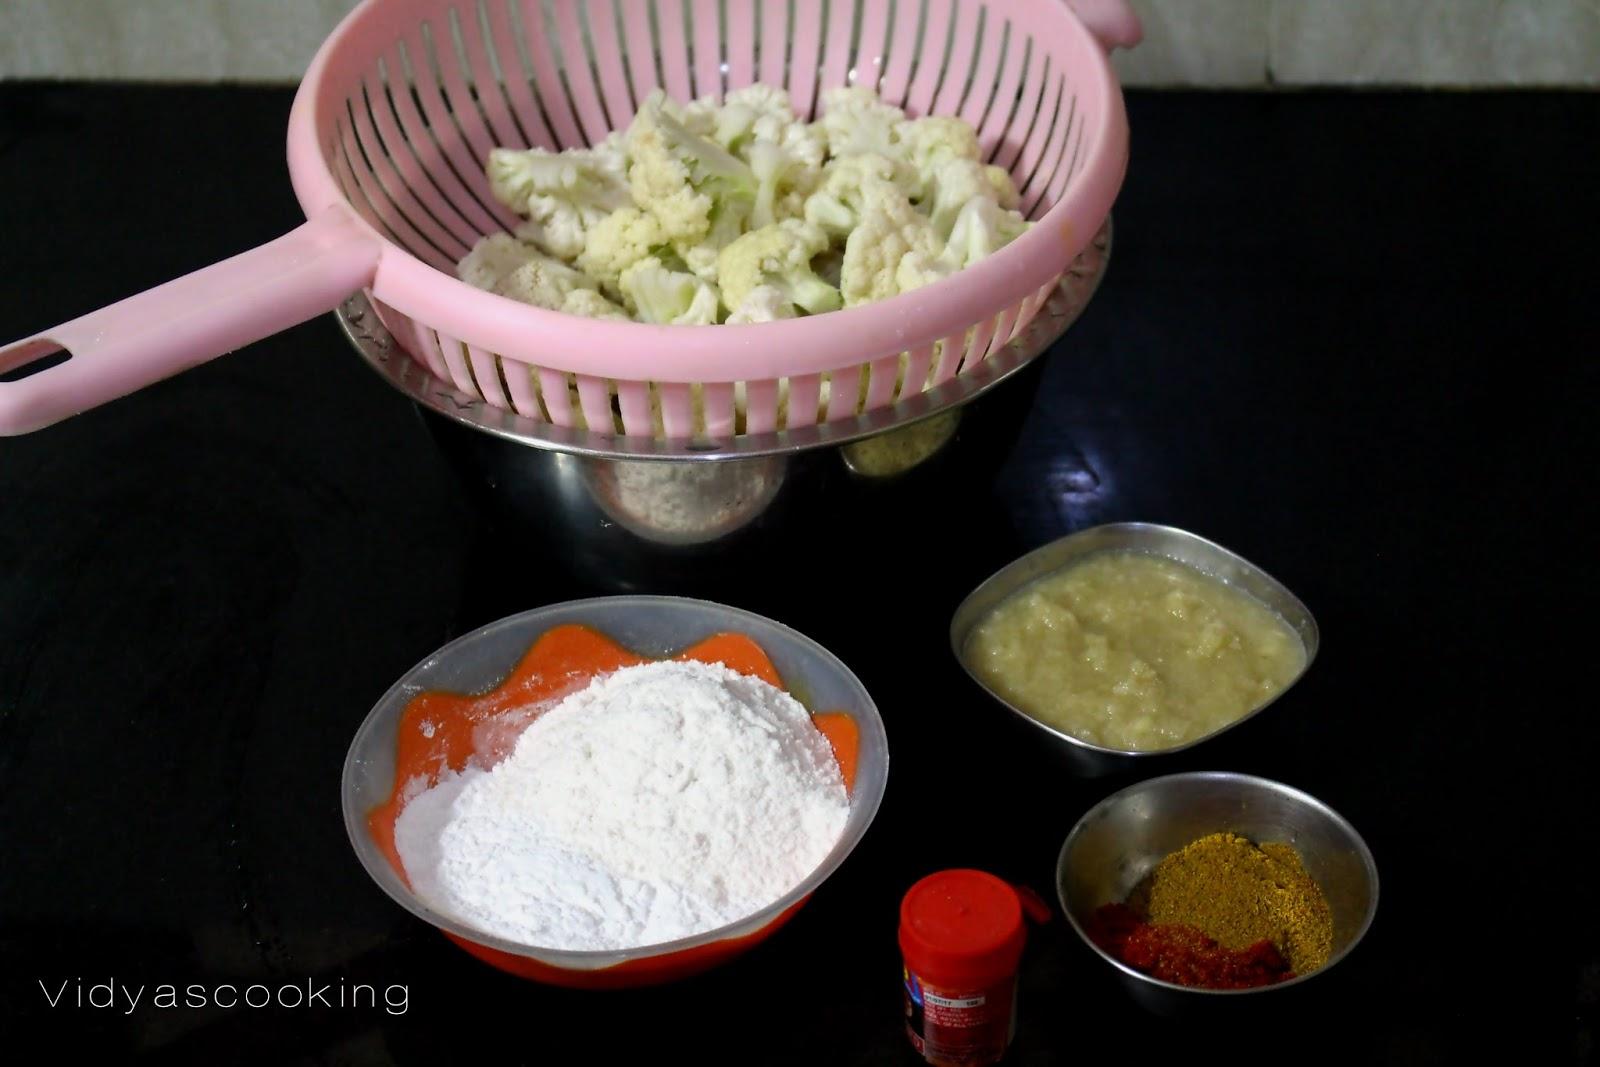 Vidyascooking street food style gobi fried rice recipe 14 tsp orange food color 1 12 tbsp ginger and garlic paste 1 tbsp garam masala 1 tbsp chilly powder salt as per taste forumfinder Image collections